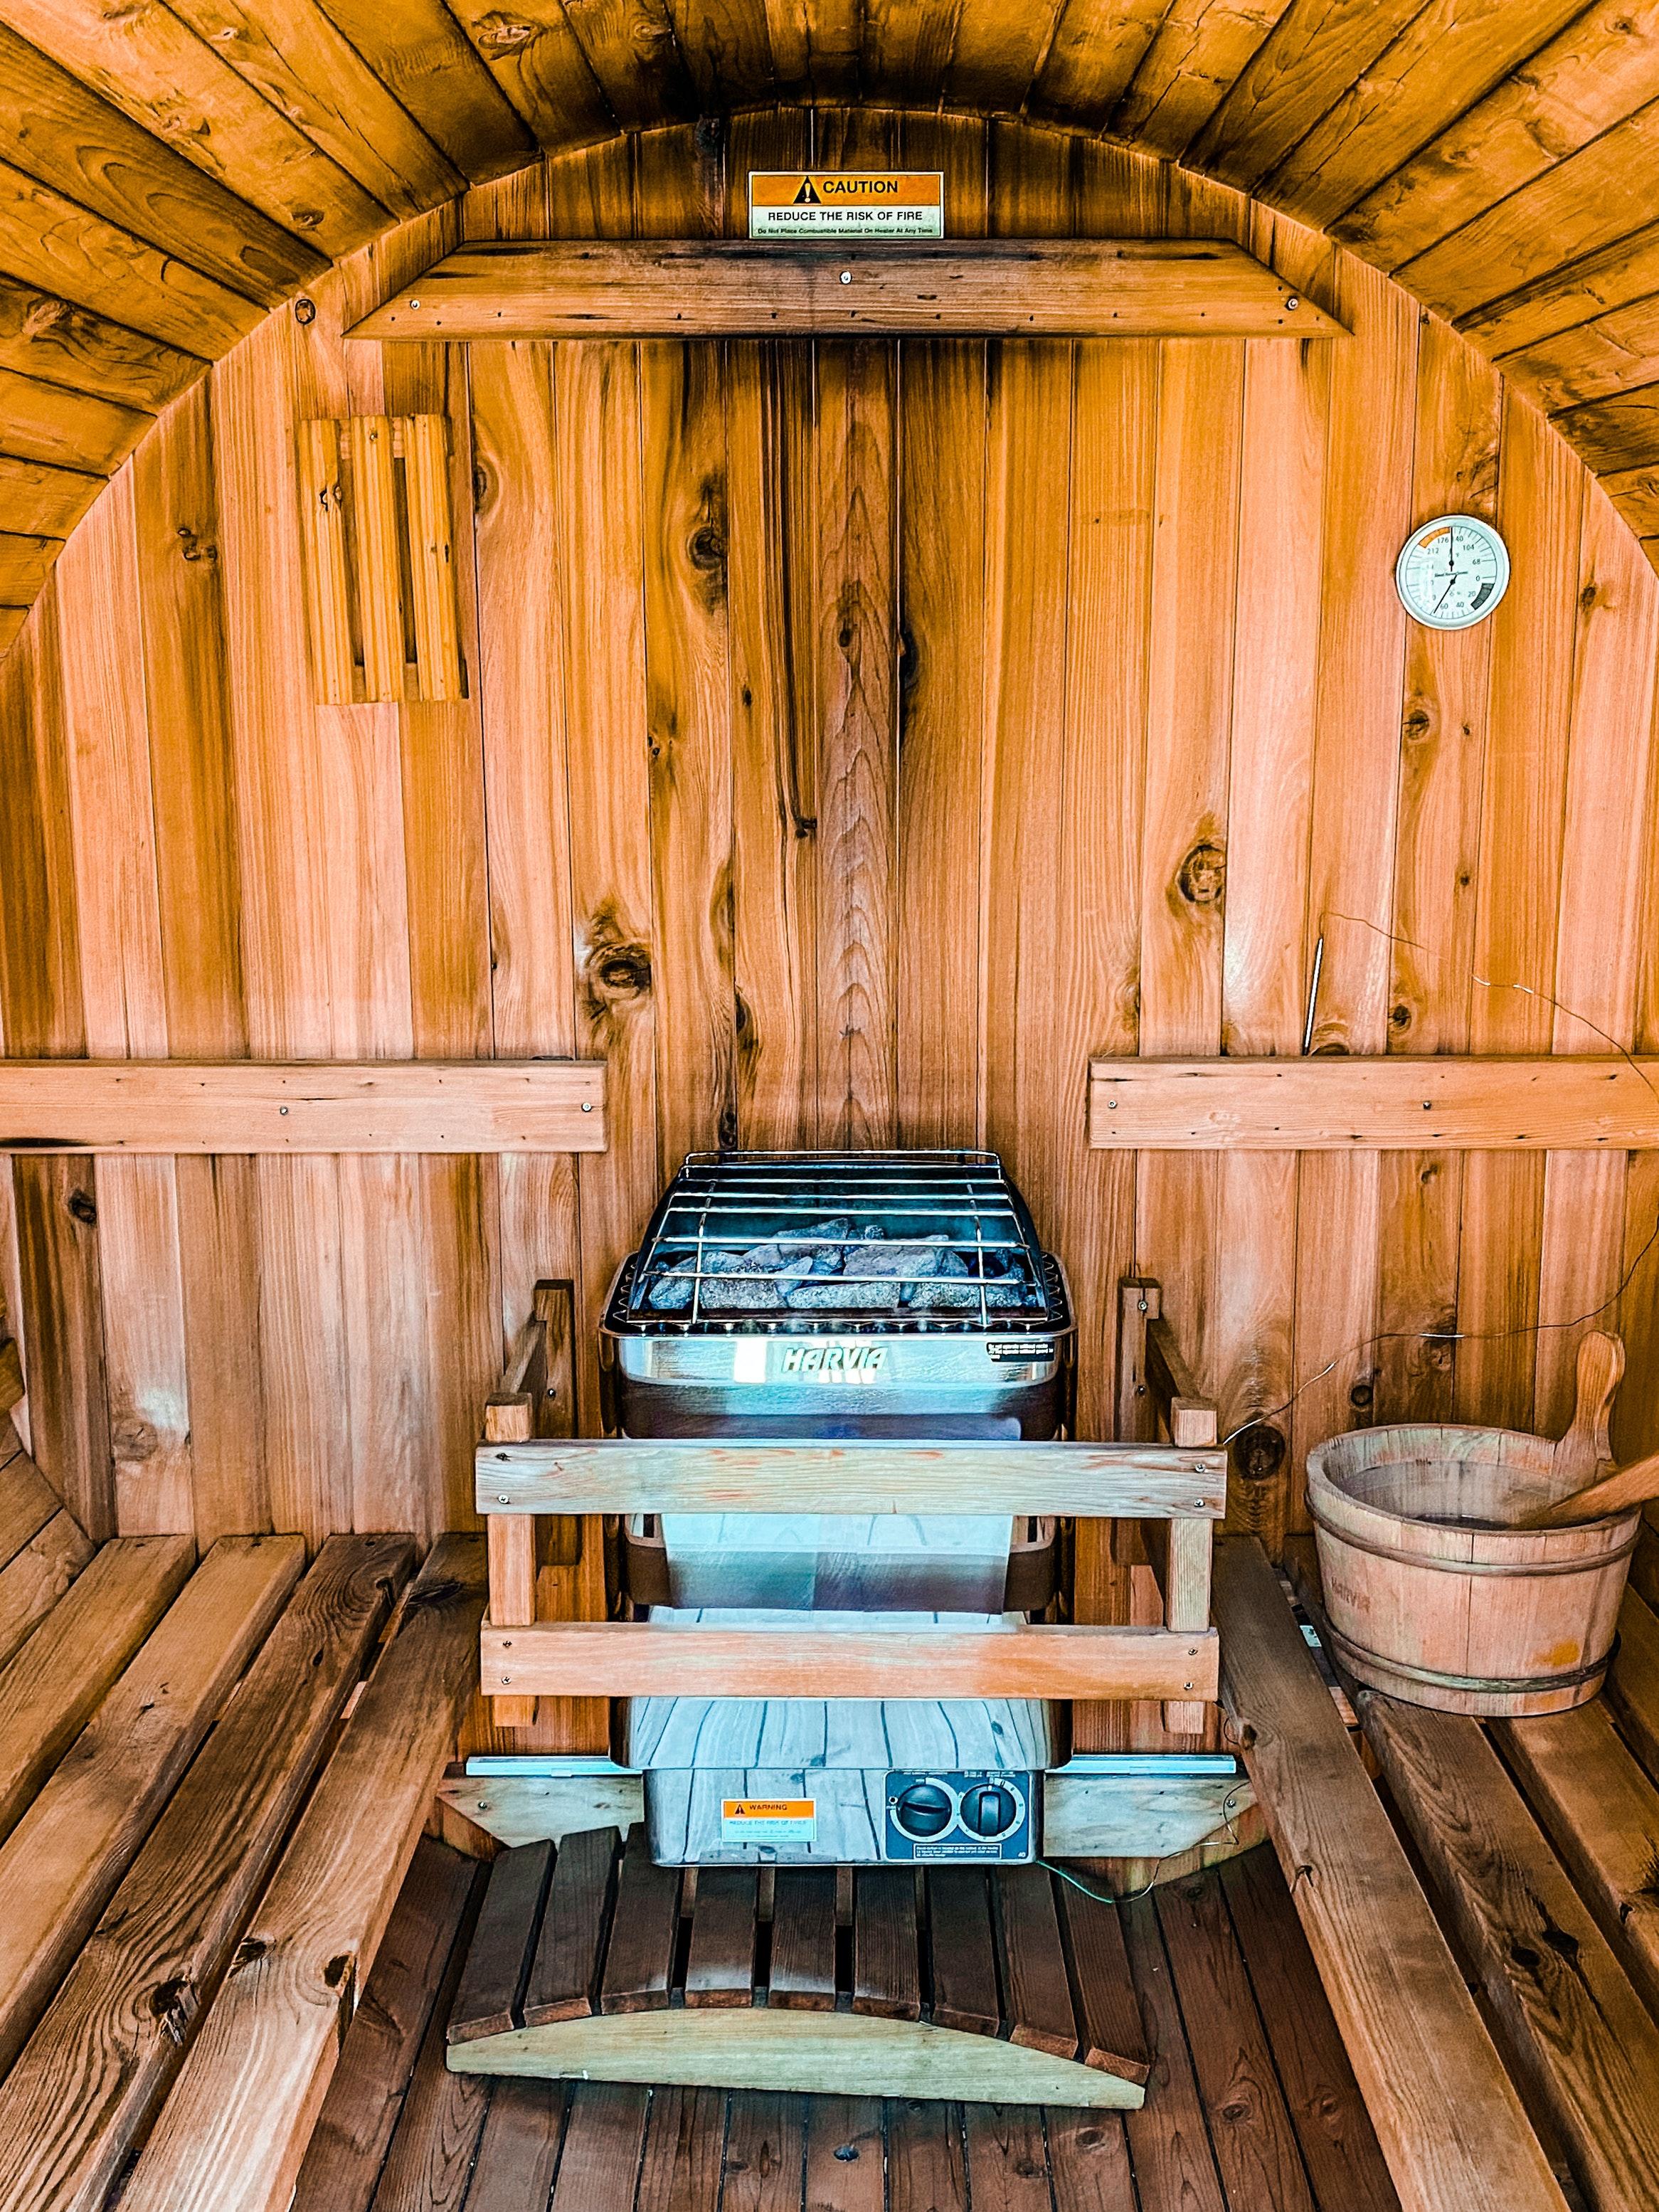 Inside the Barrel Sauna